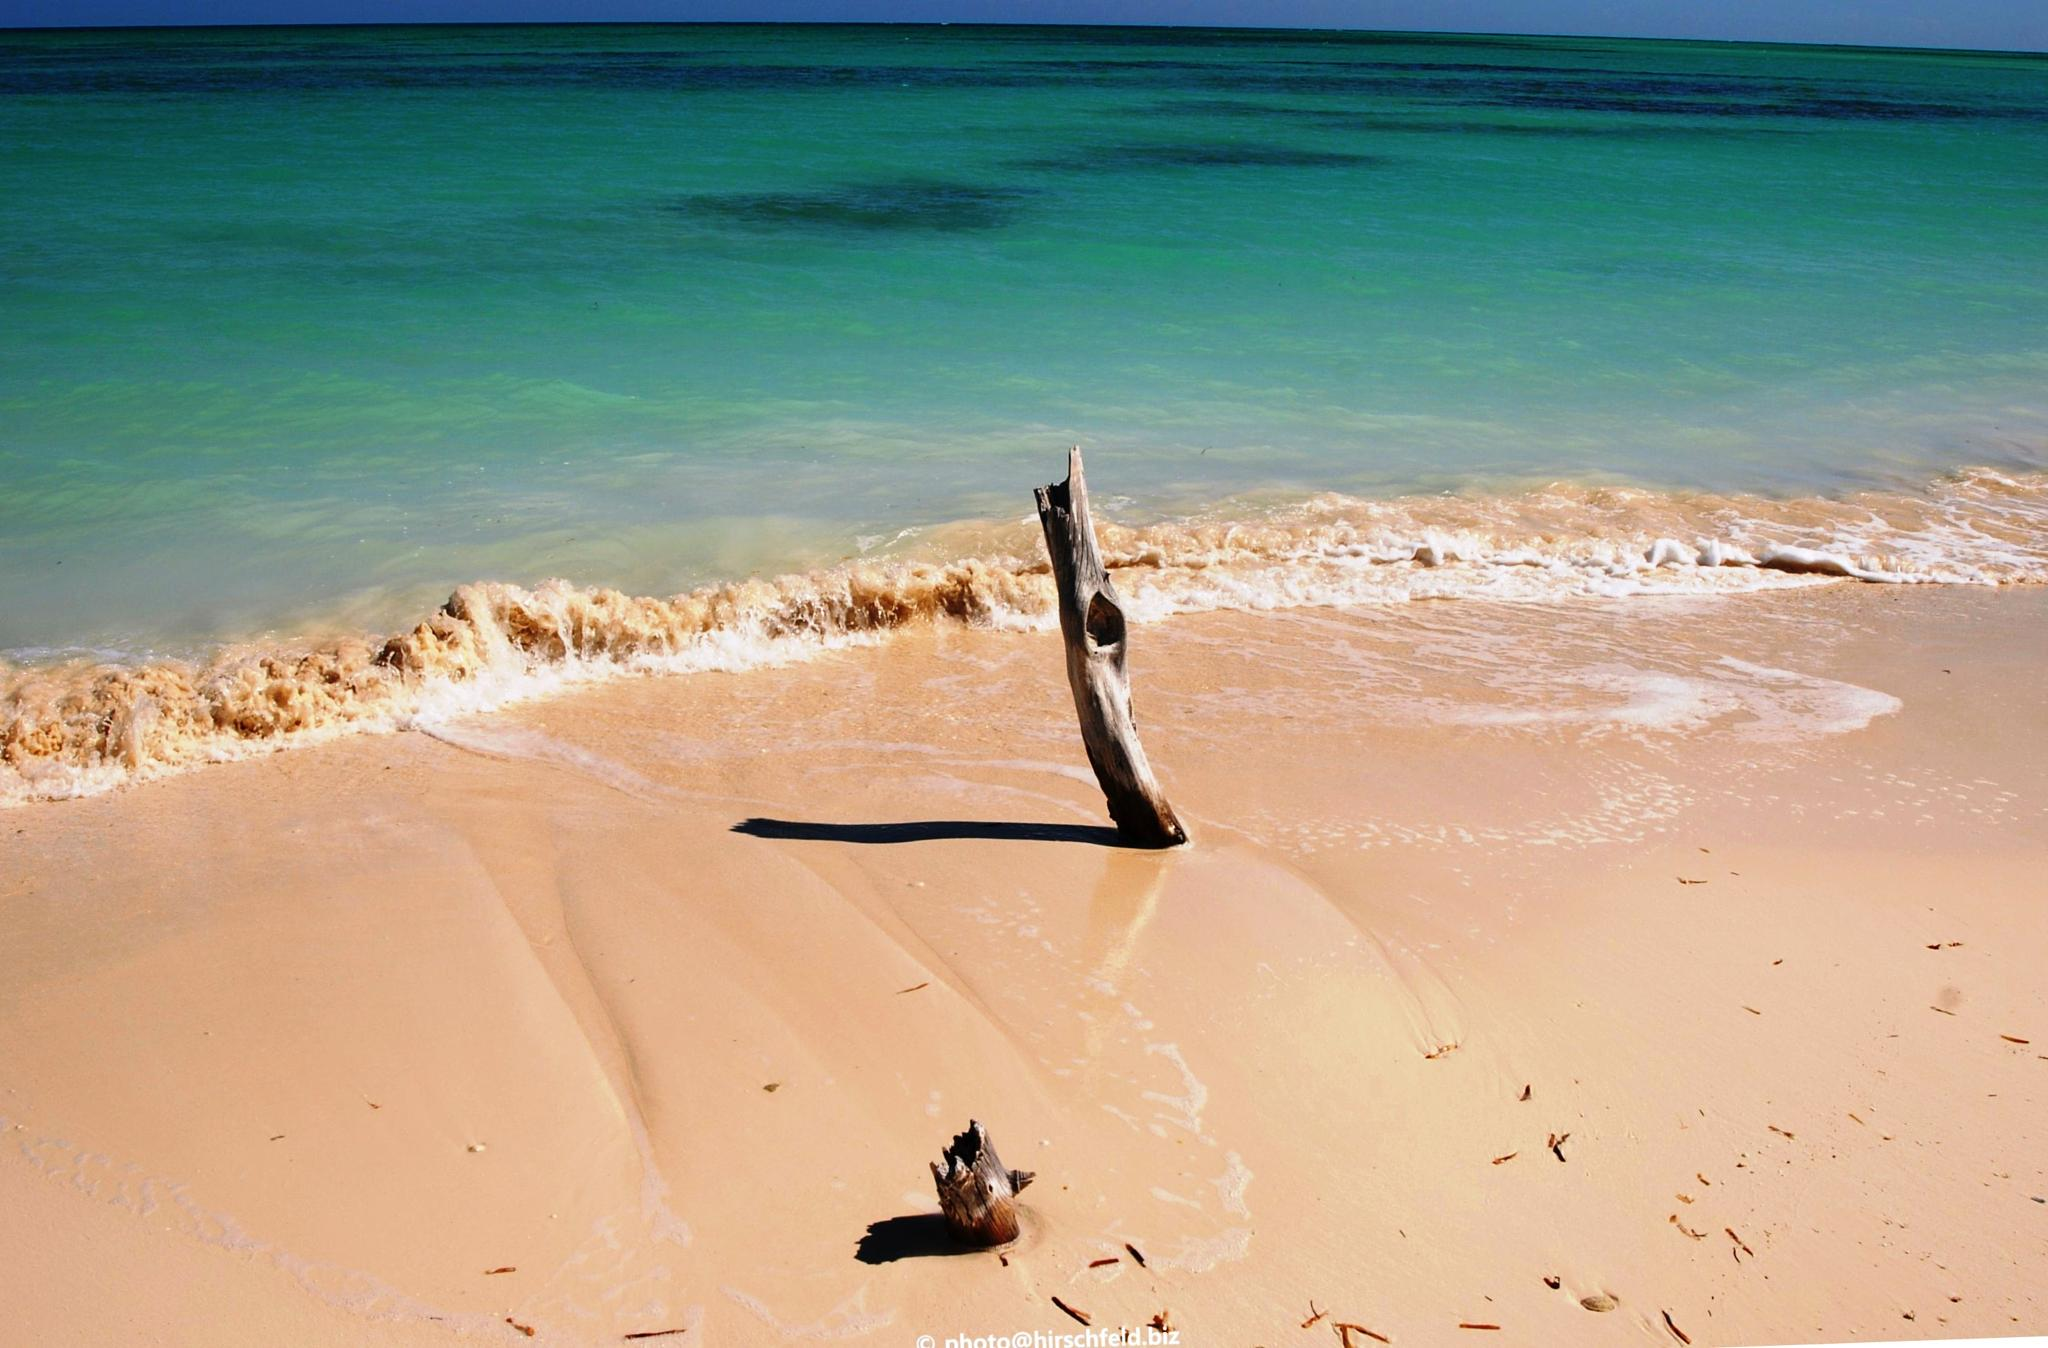 On the beach in Cuba by edmund hirschfeld